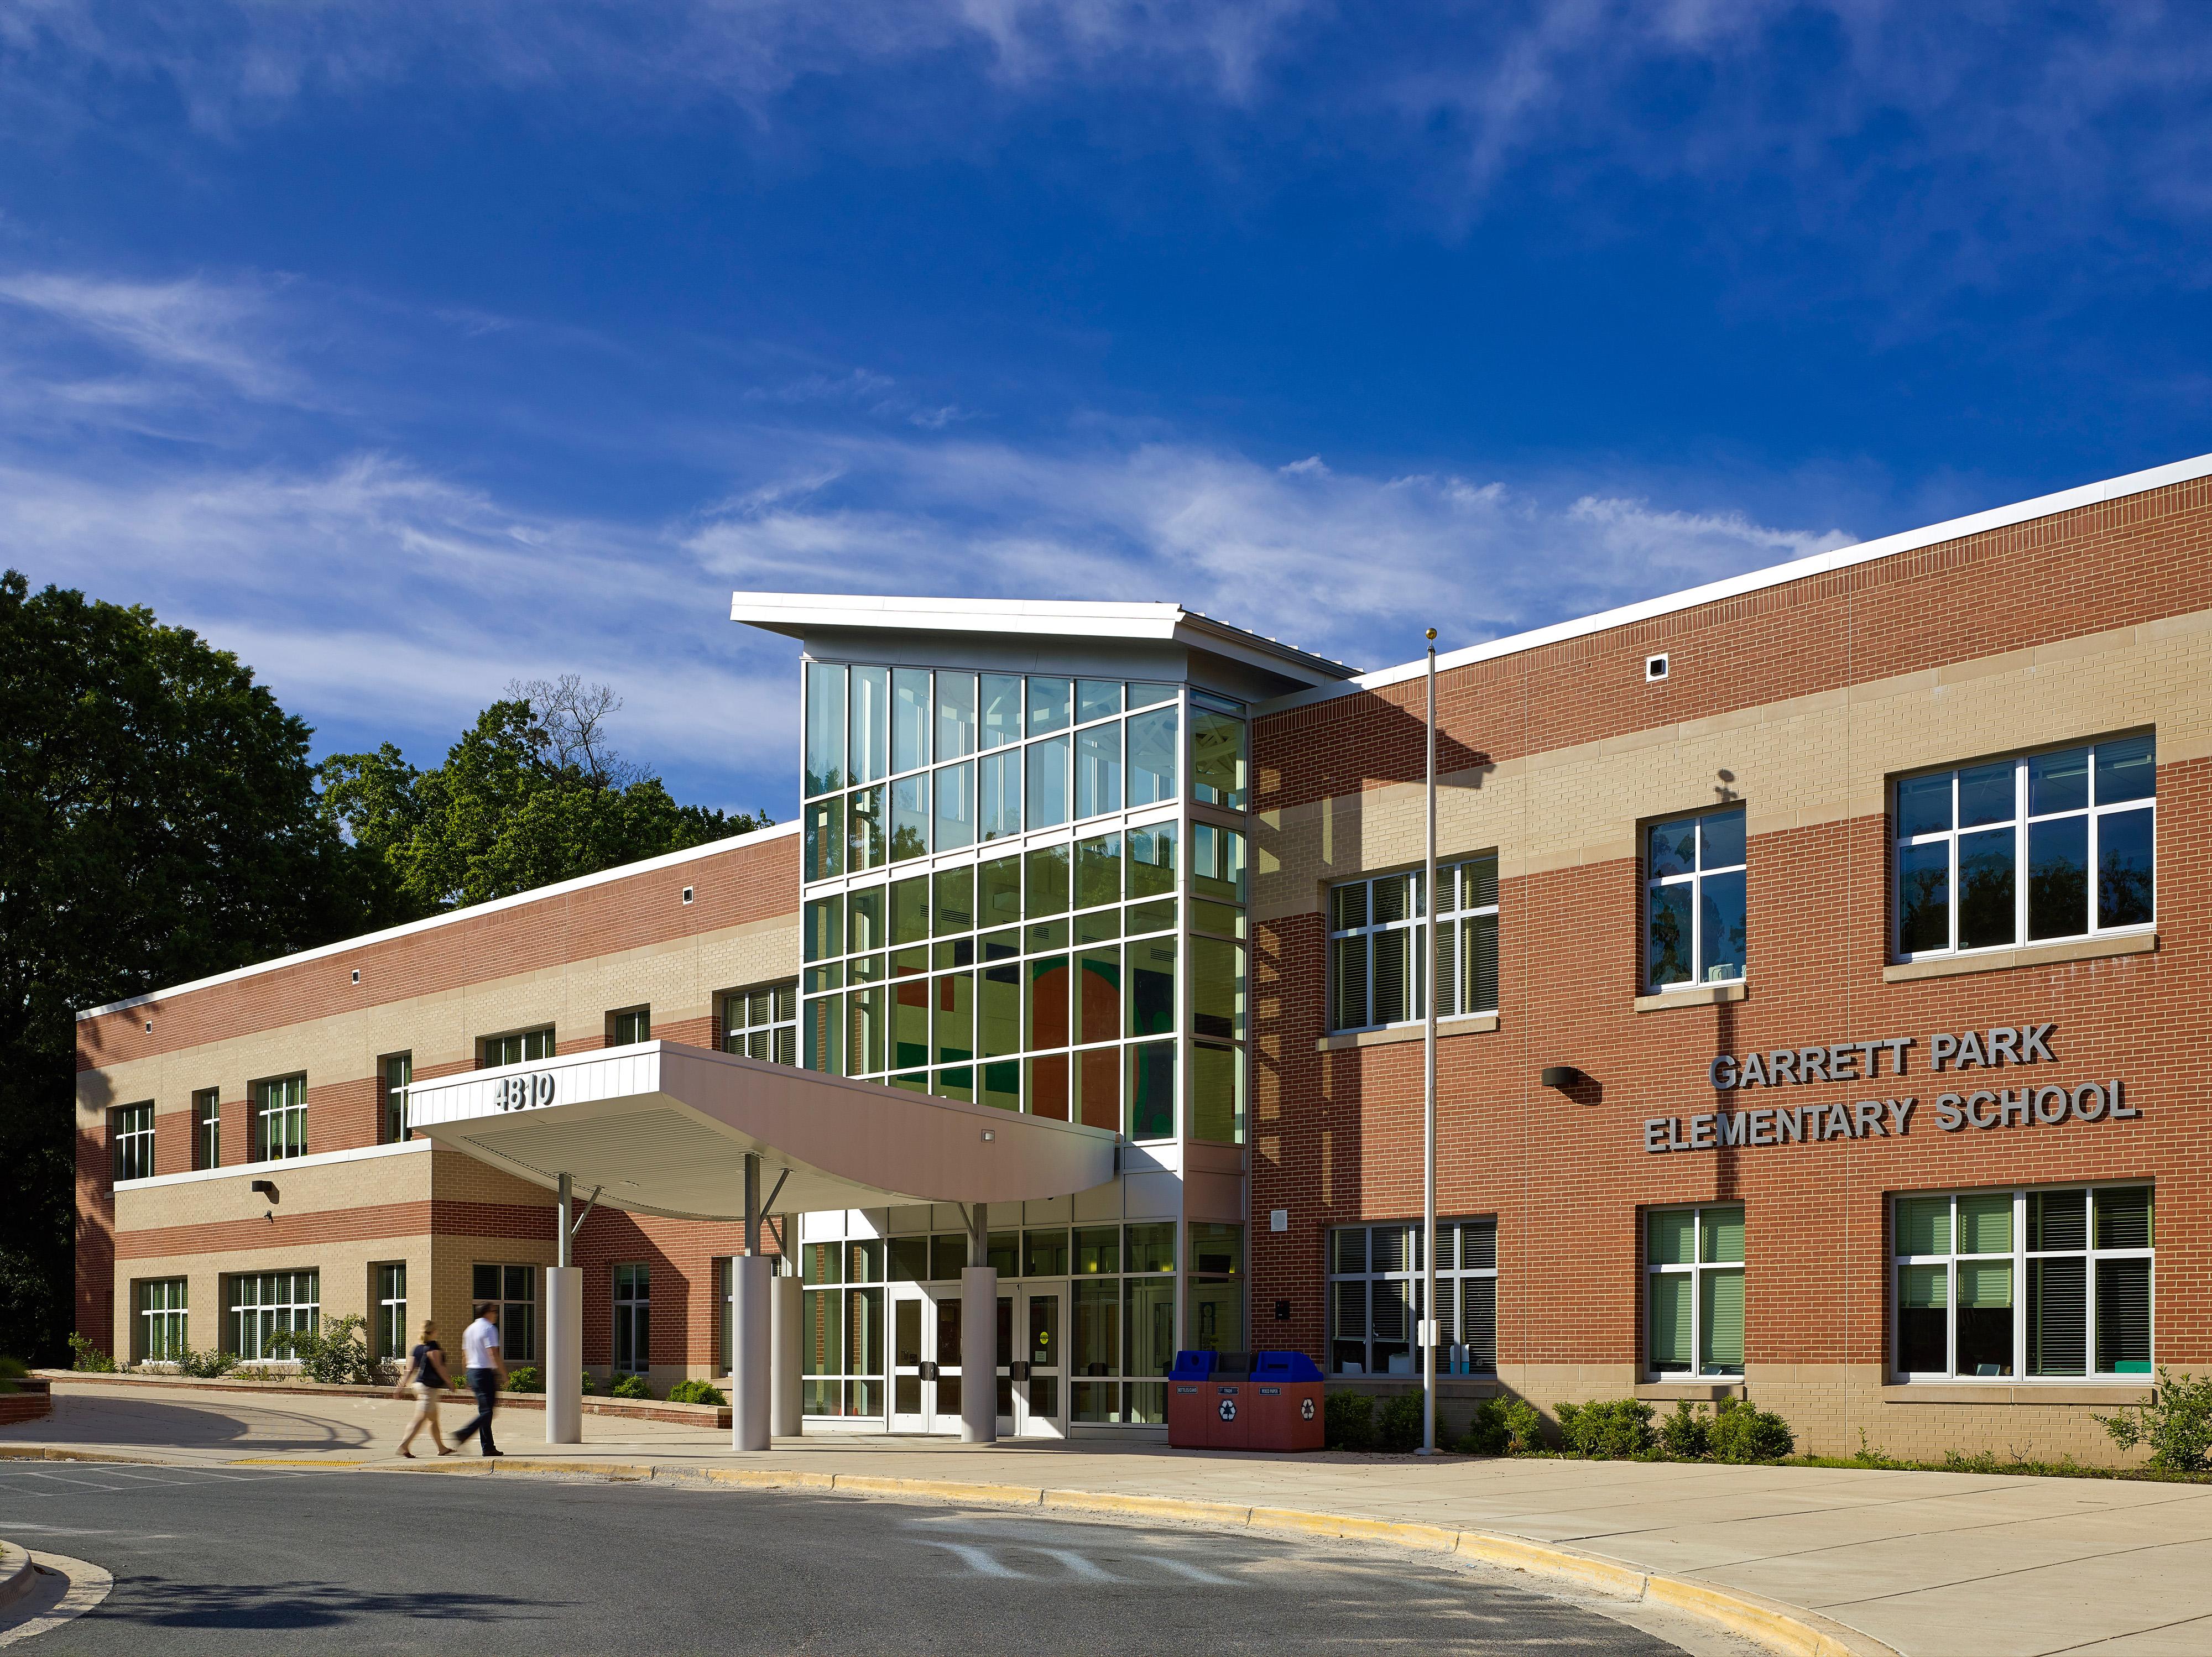 Garrett Park Elementary School